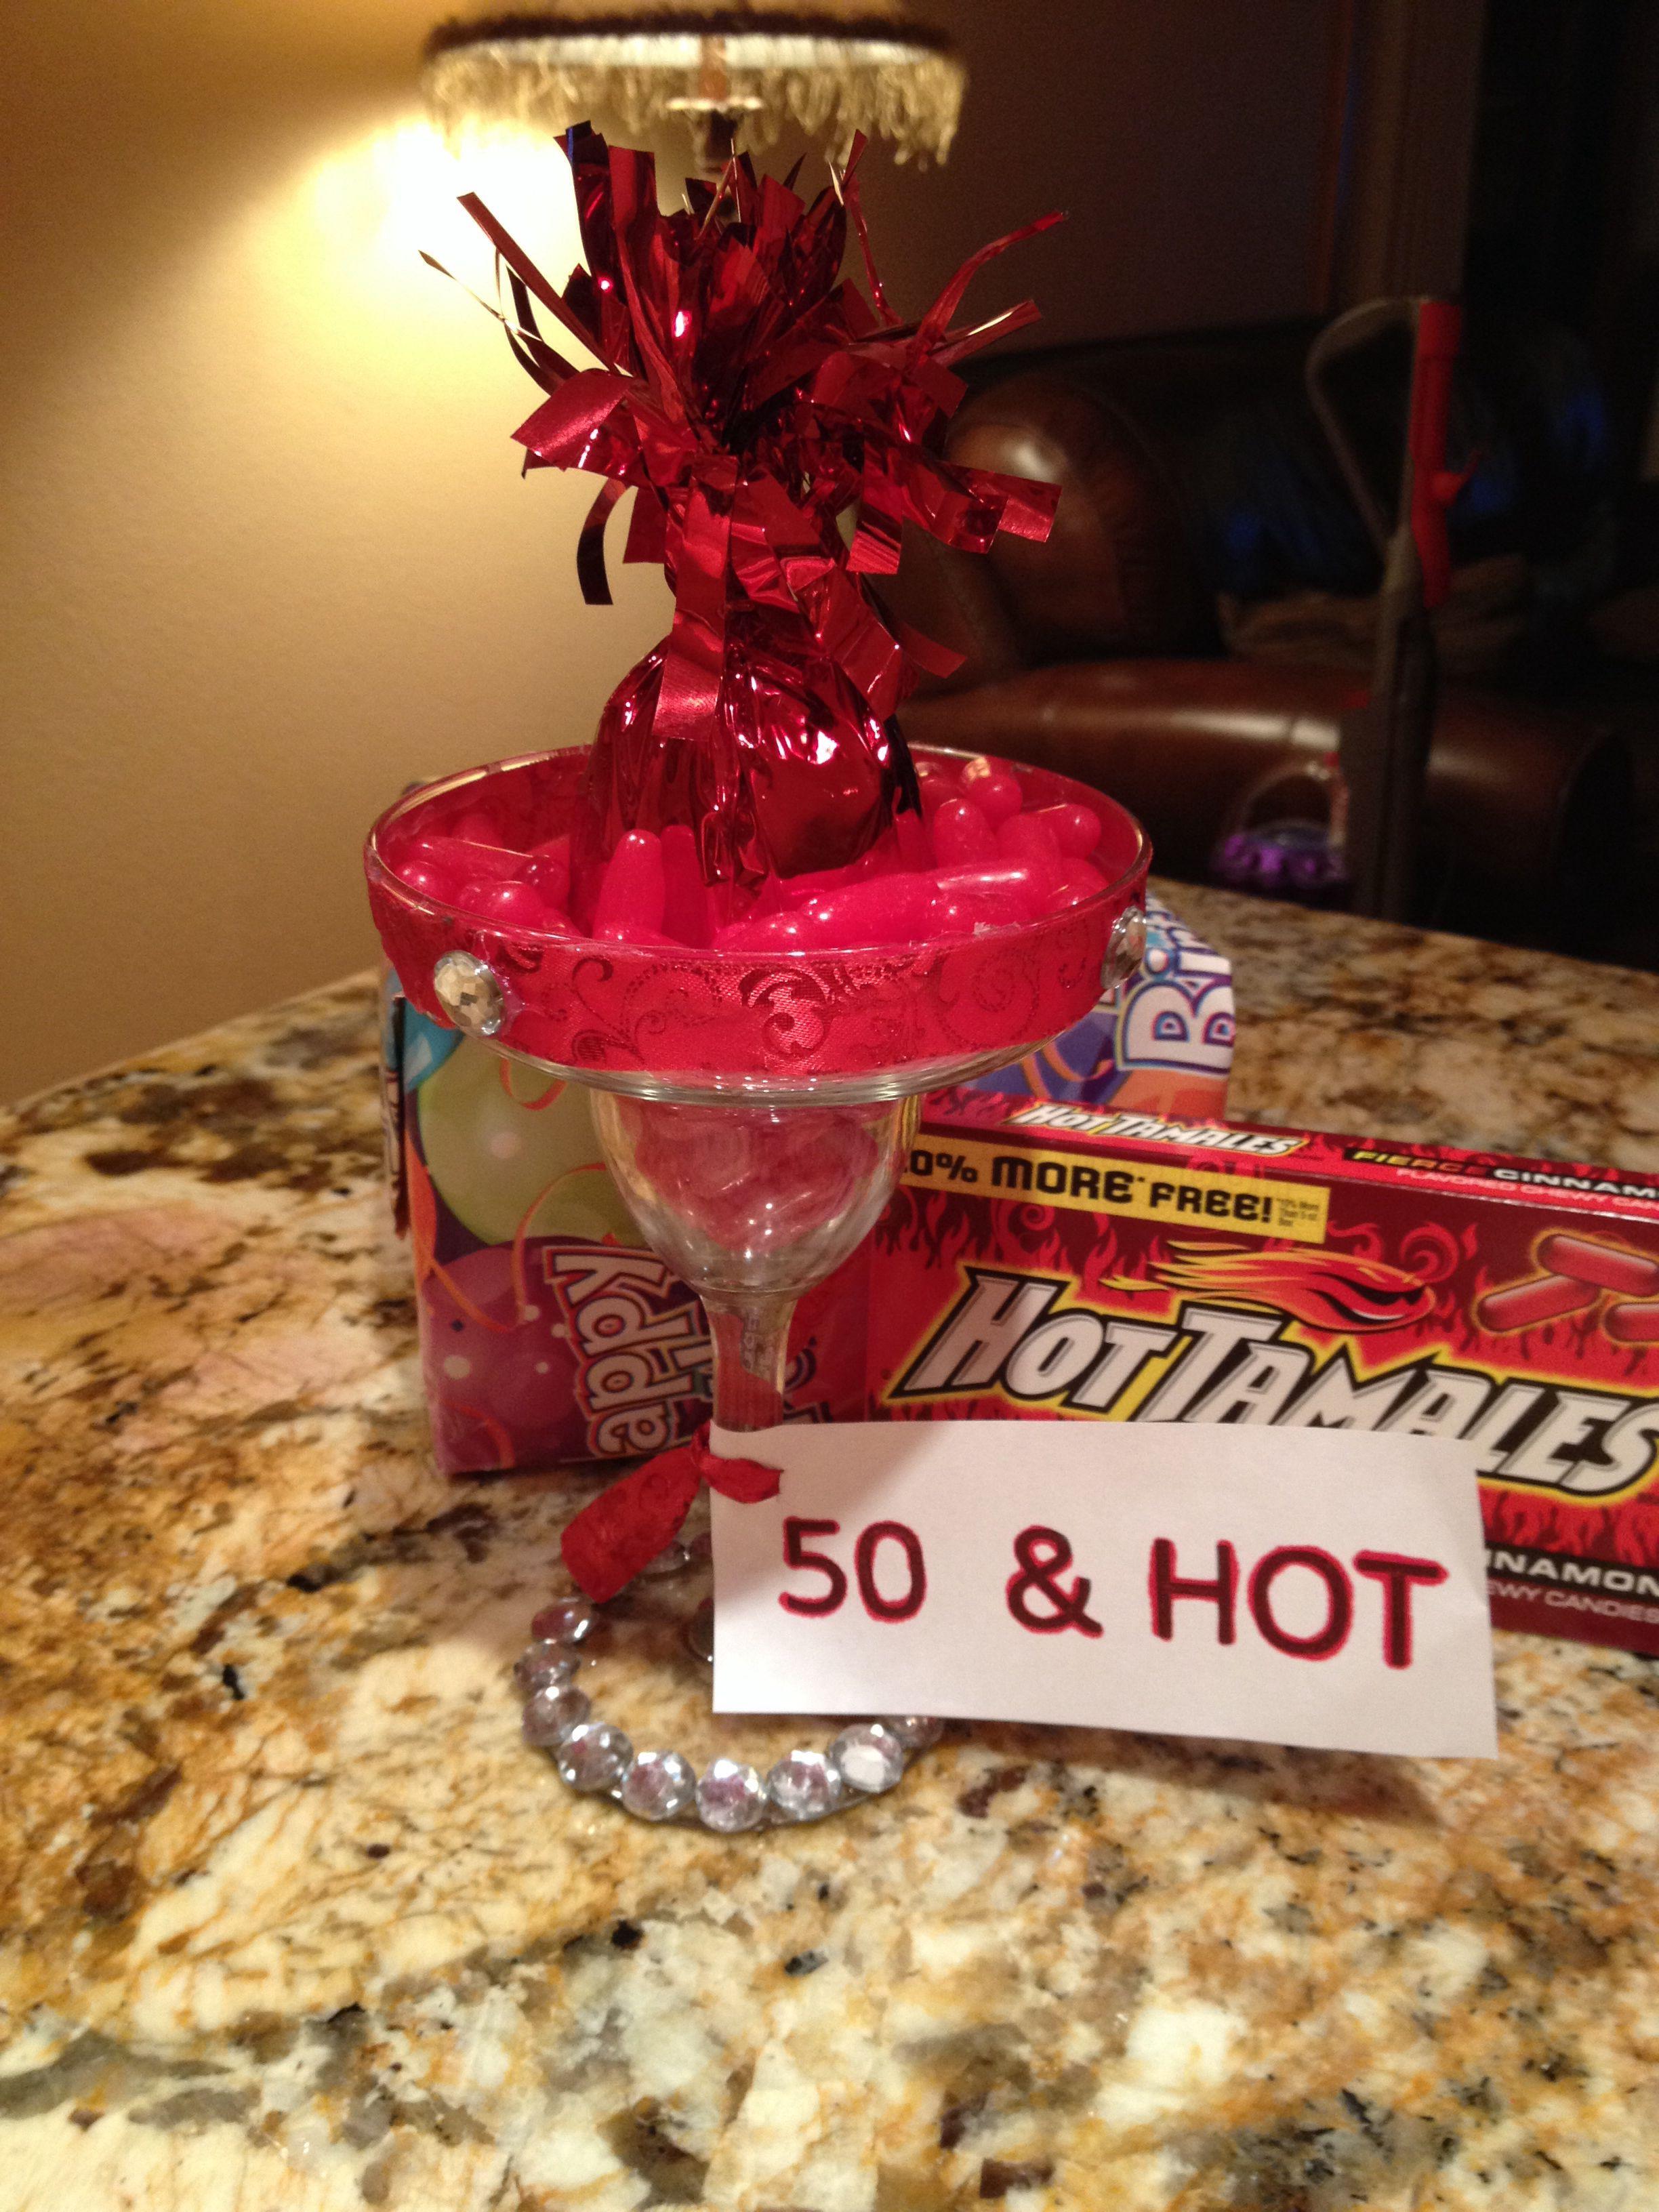 50th birthday gift idea! Drinking glass + hot tamales